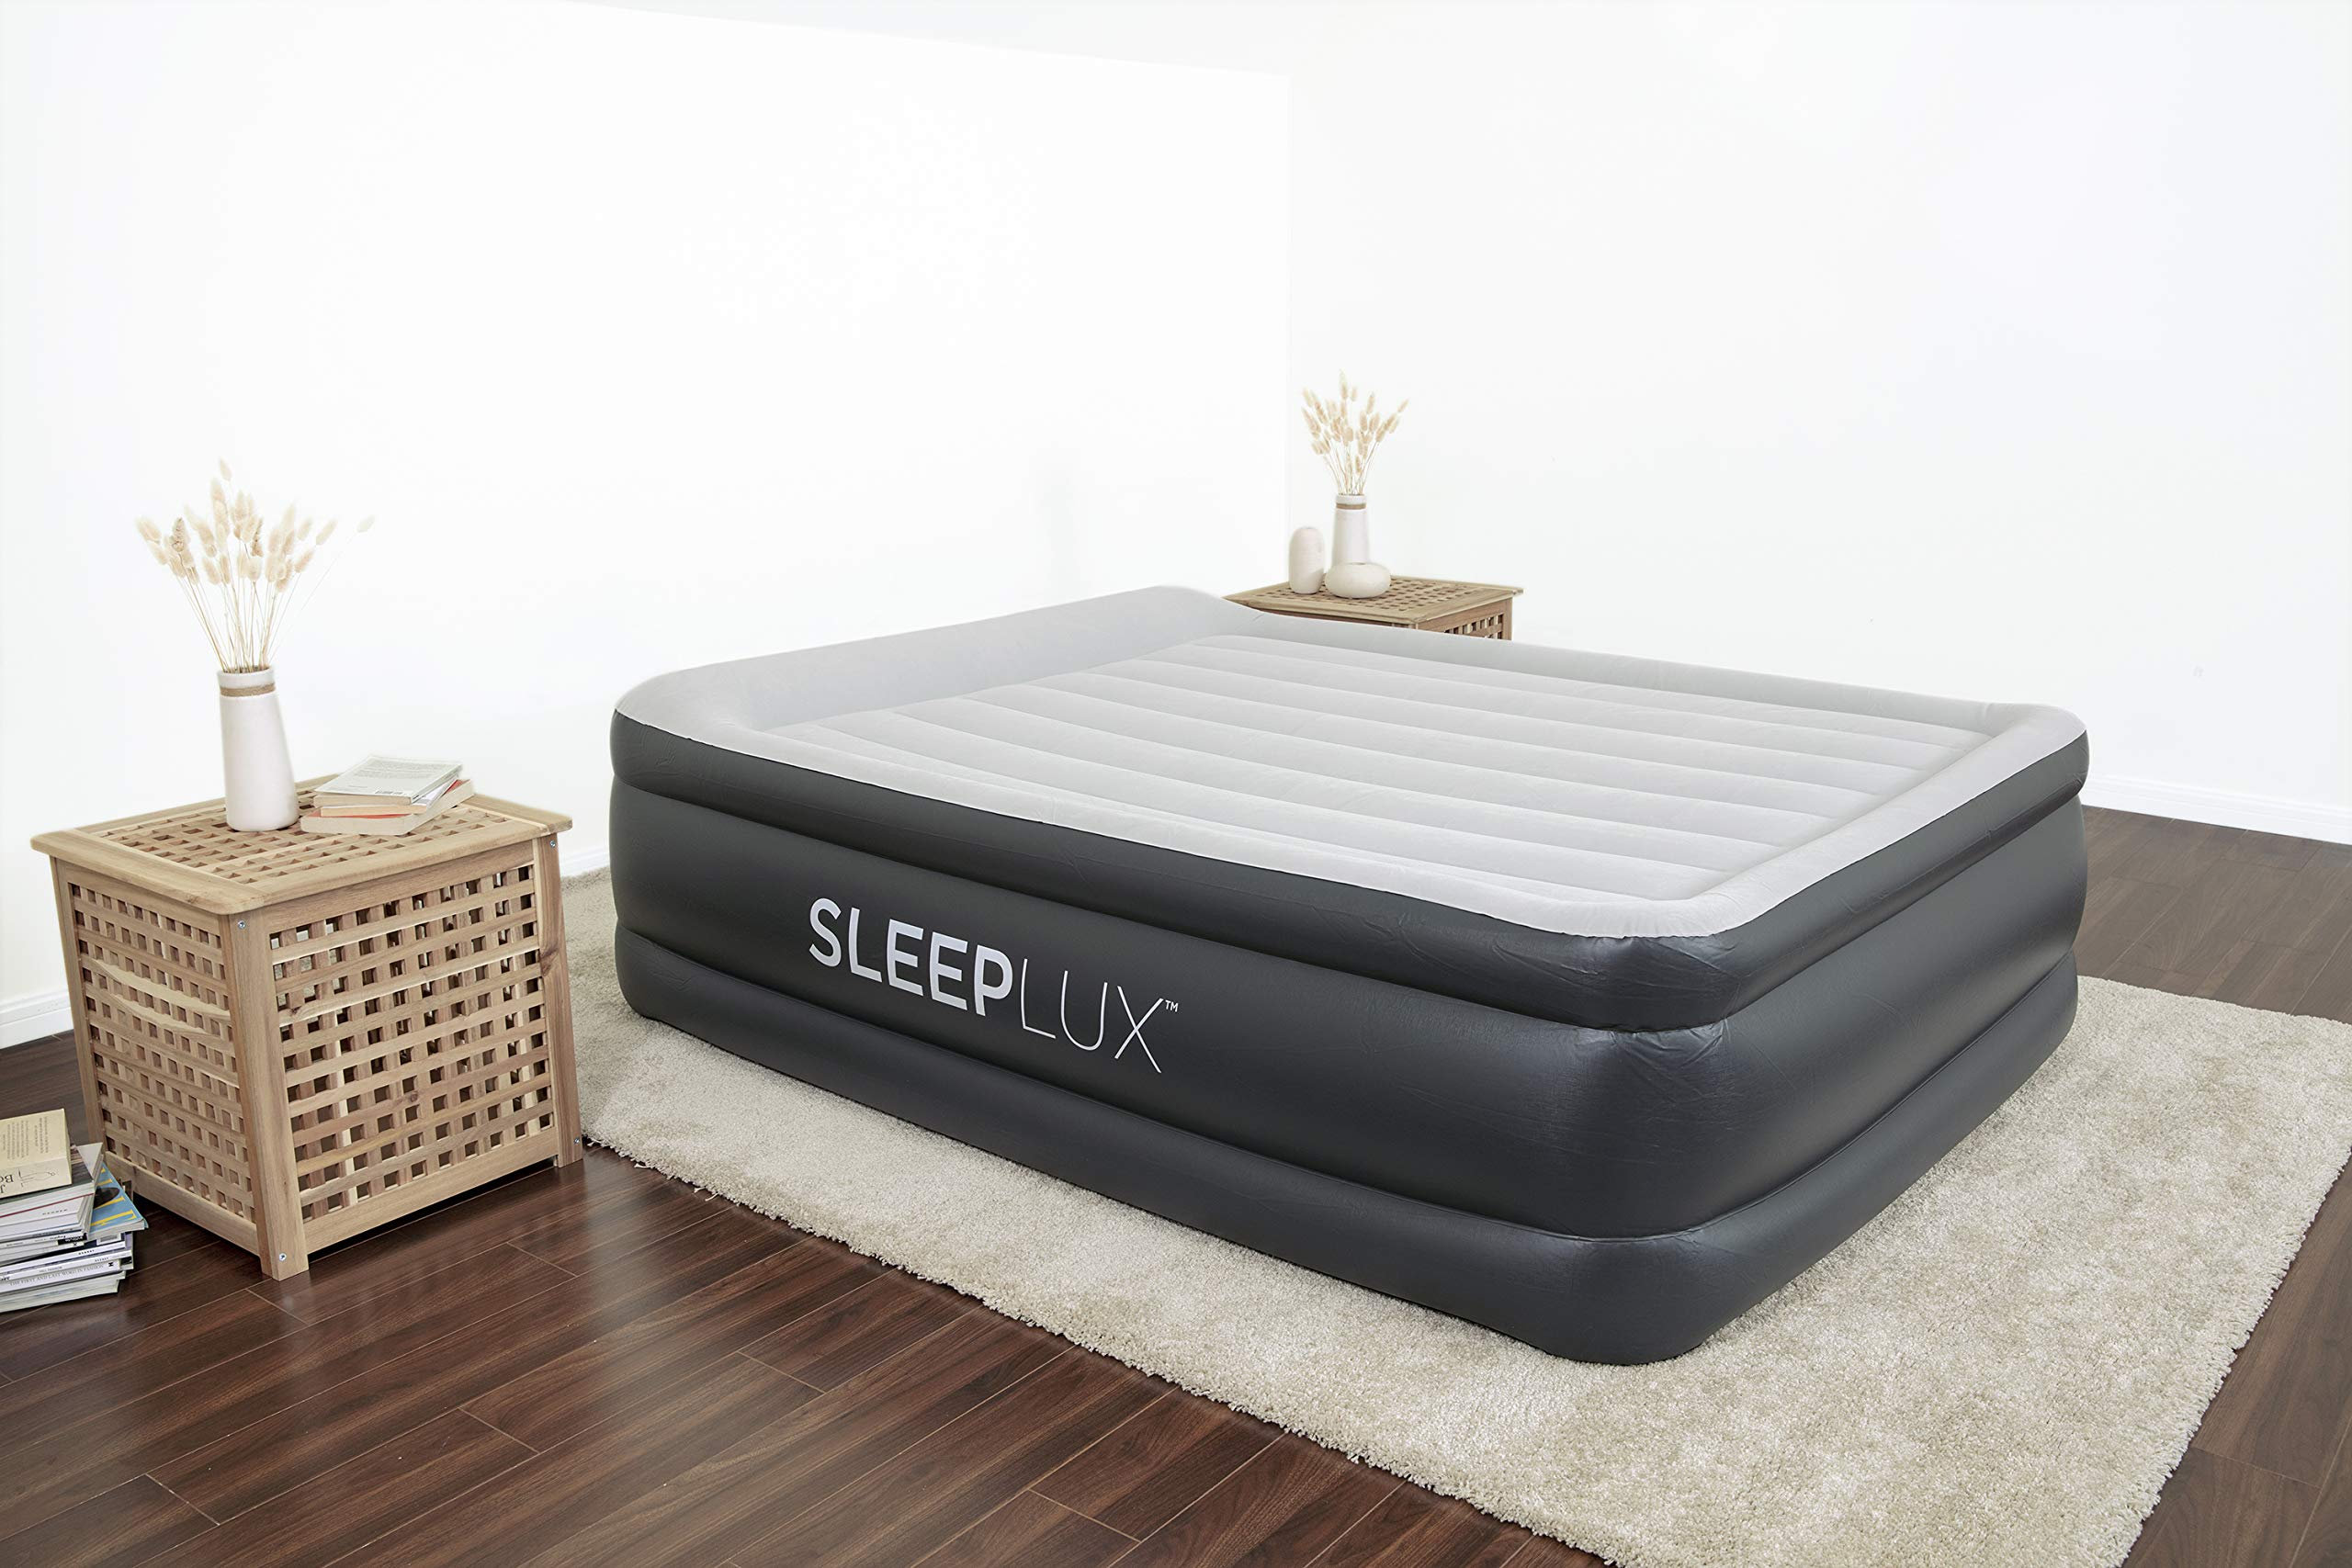 SleepLux Mattress Inflatable Shoulder Material